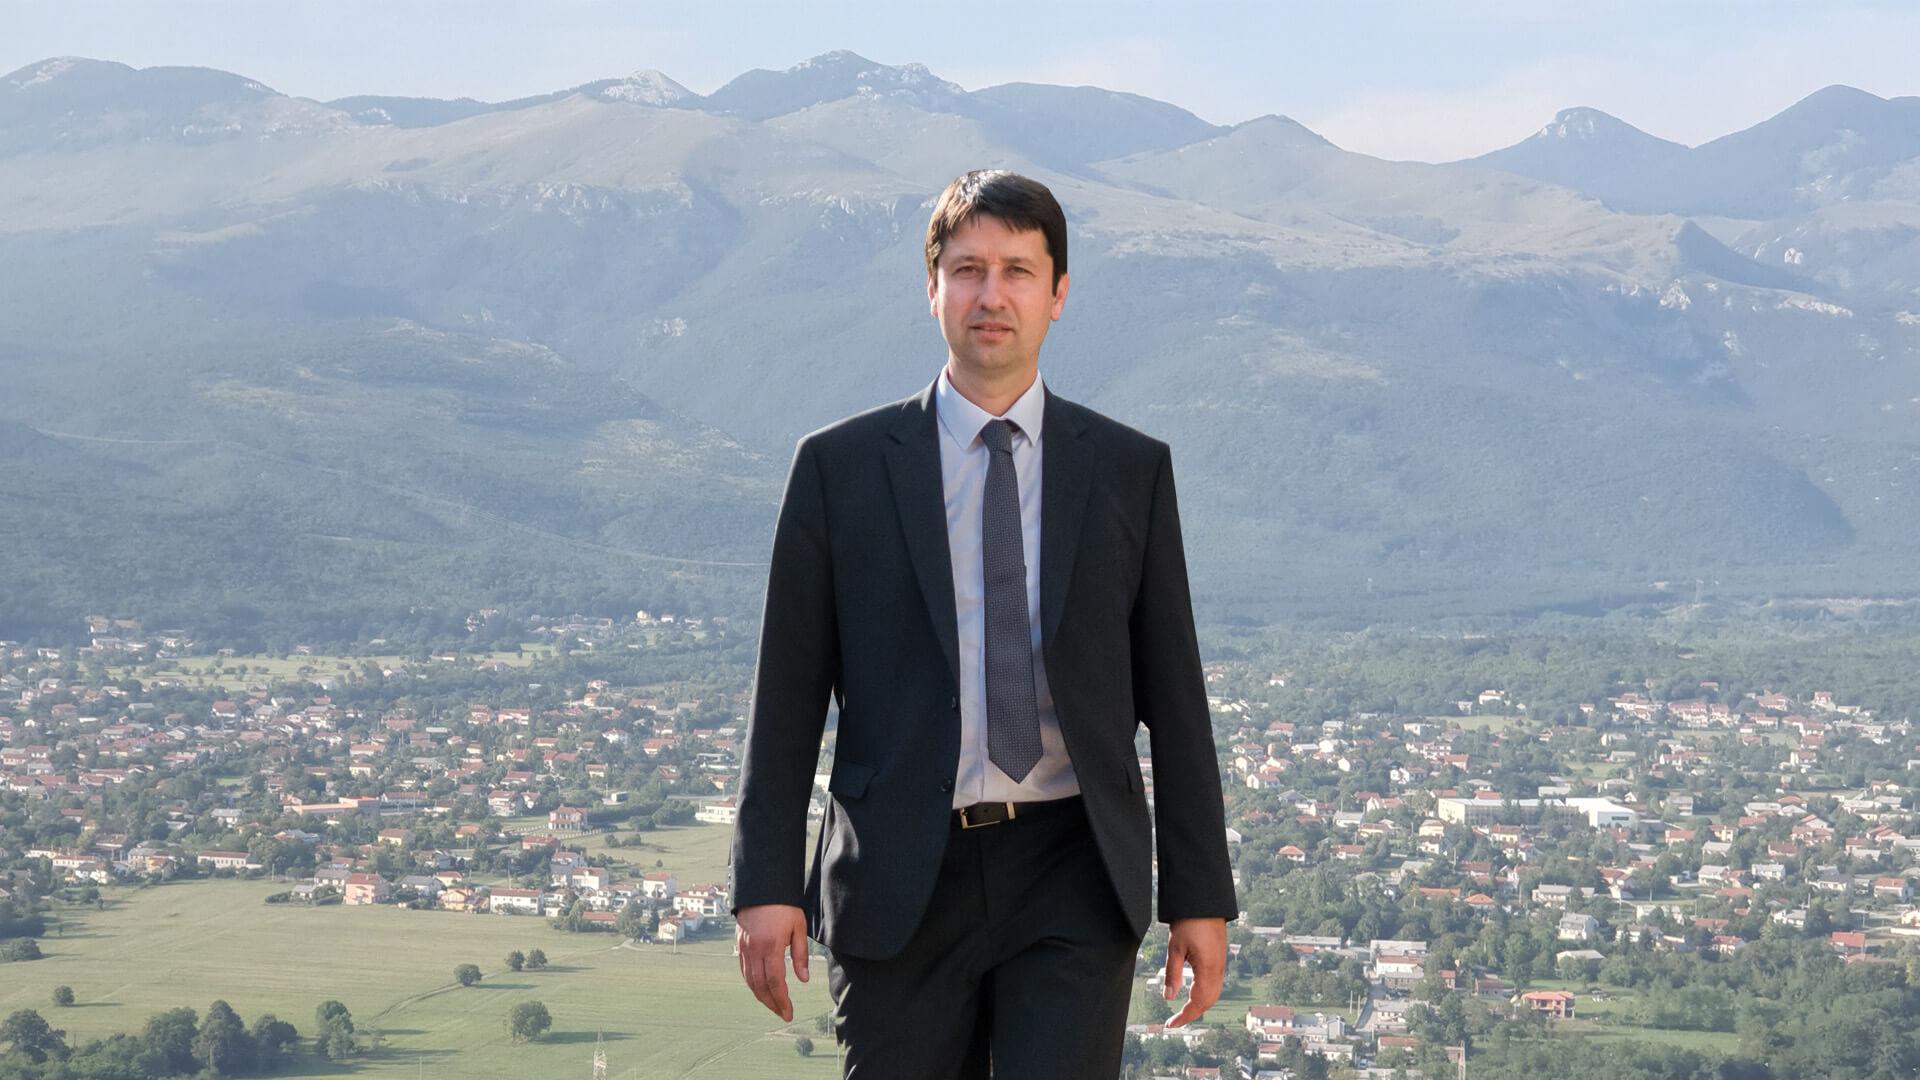 Robert-Marcelja-kandidatura-2021 - Biografija -